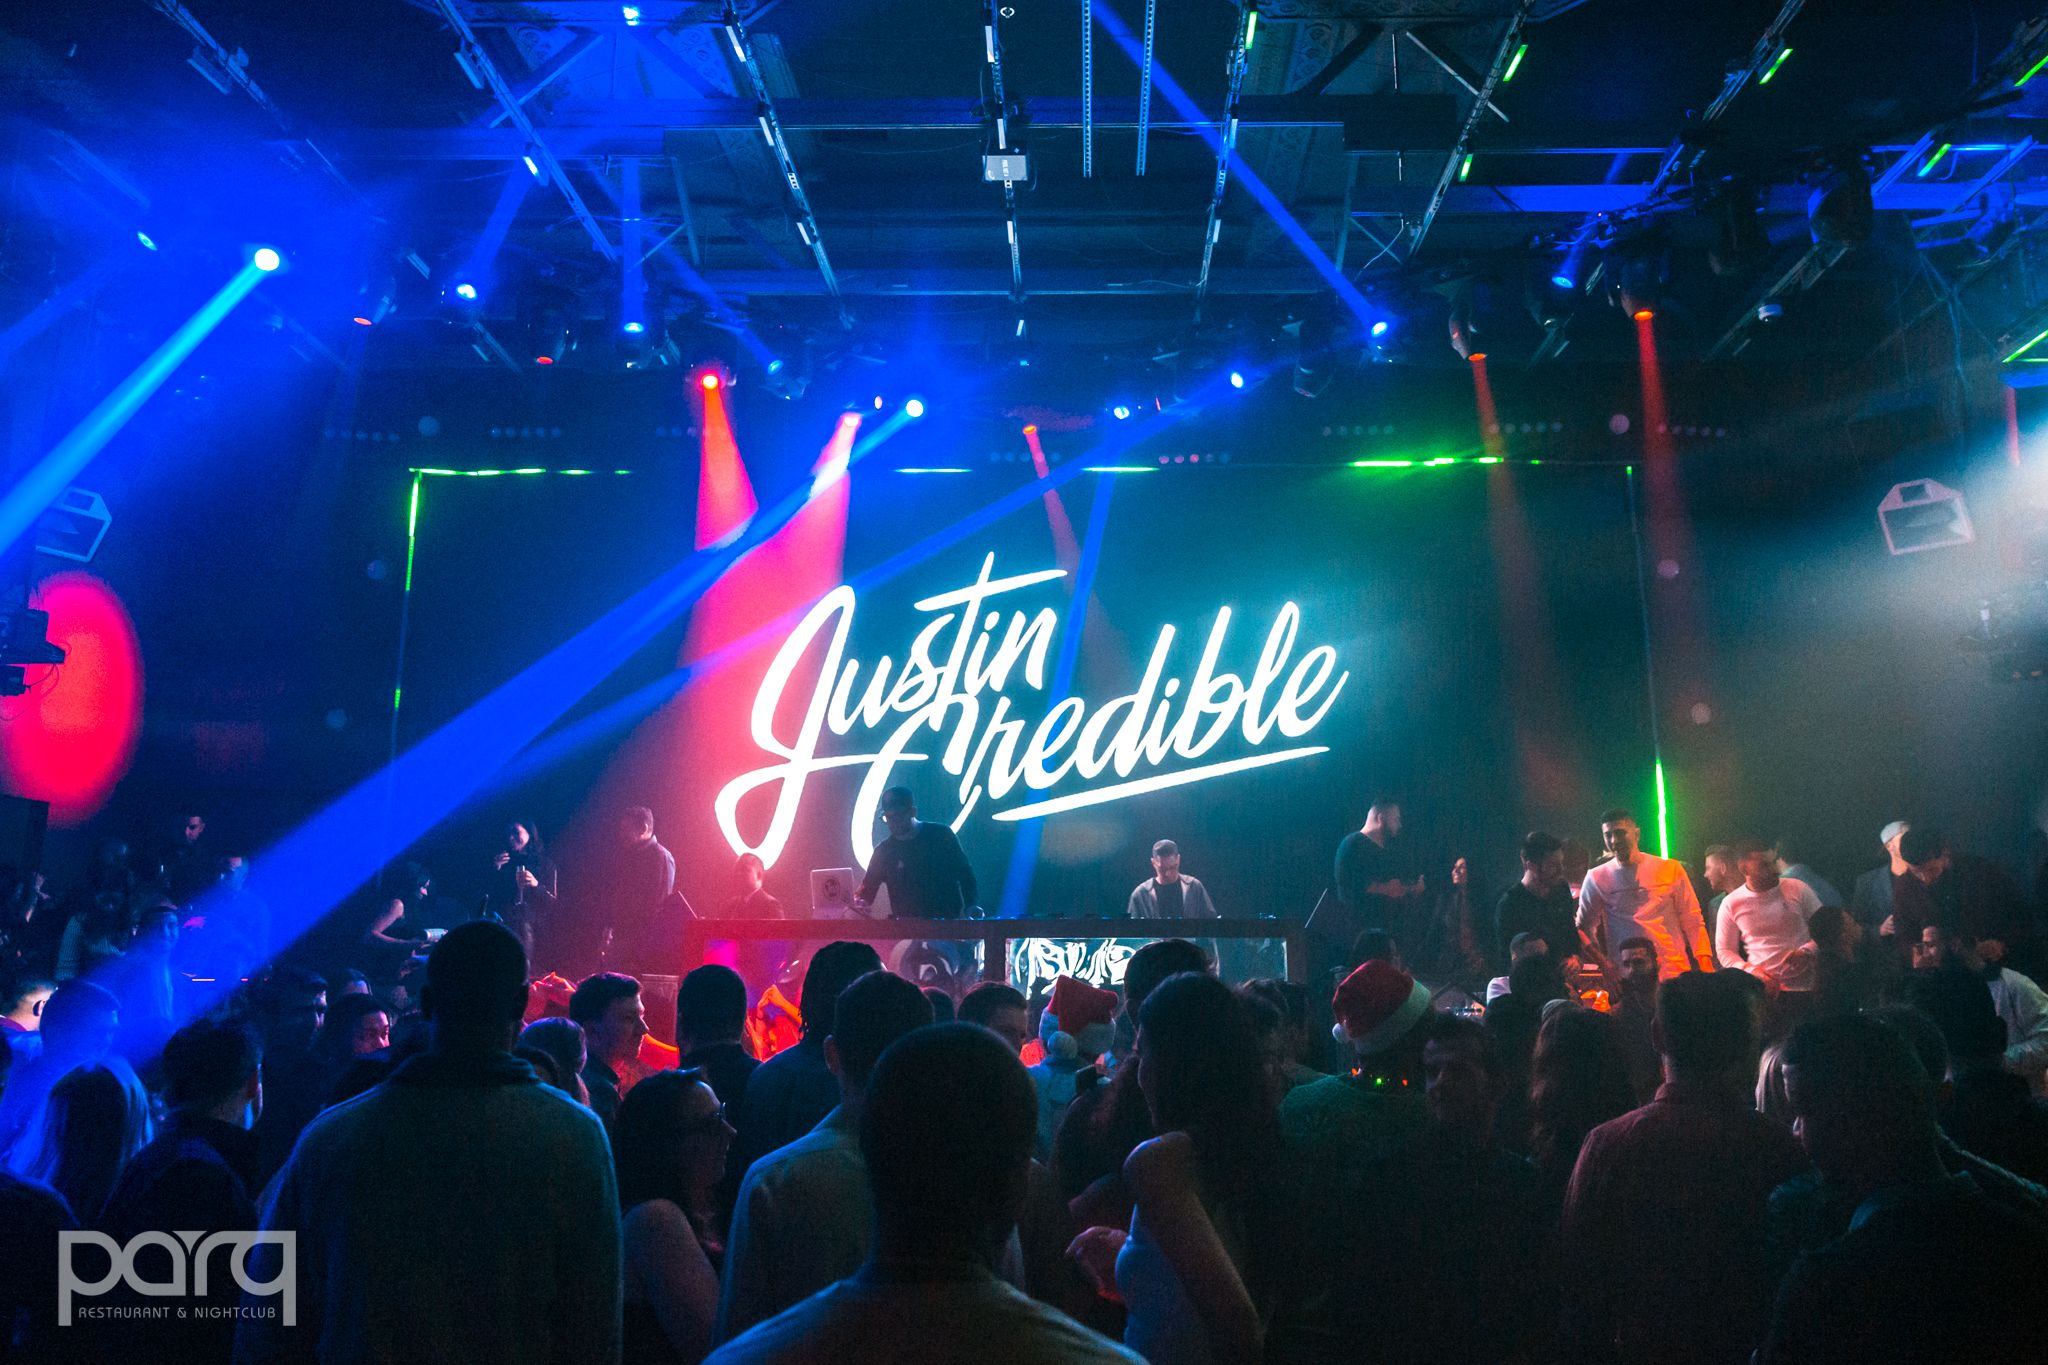 12.08.18 Parq - Justin Credible-28.jpg